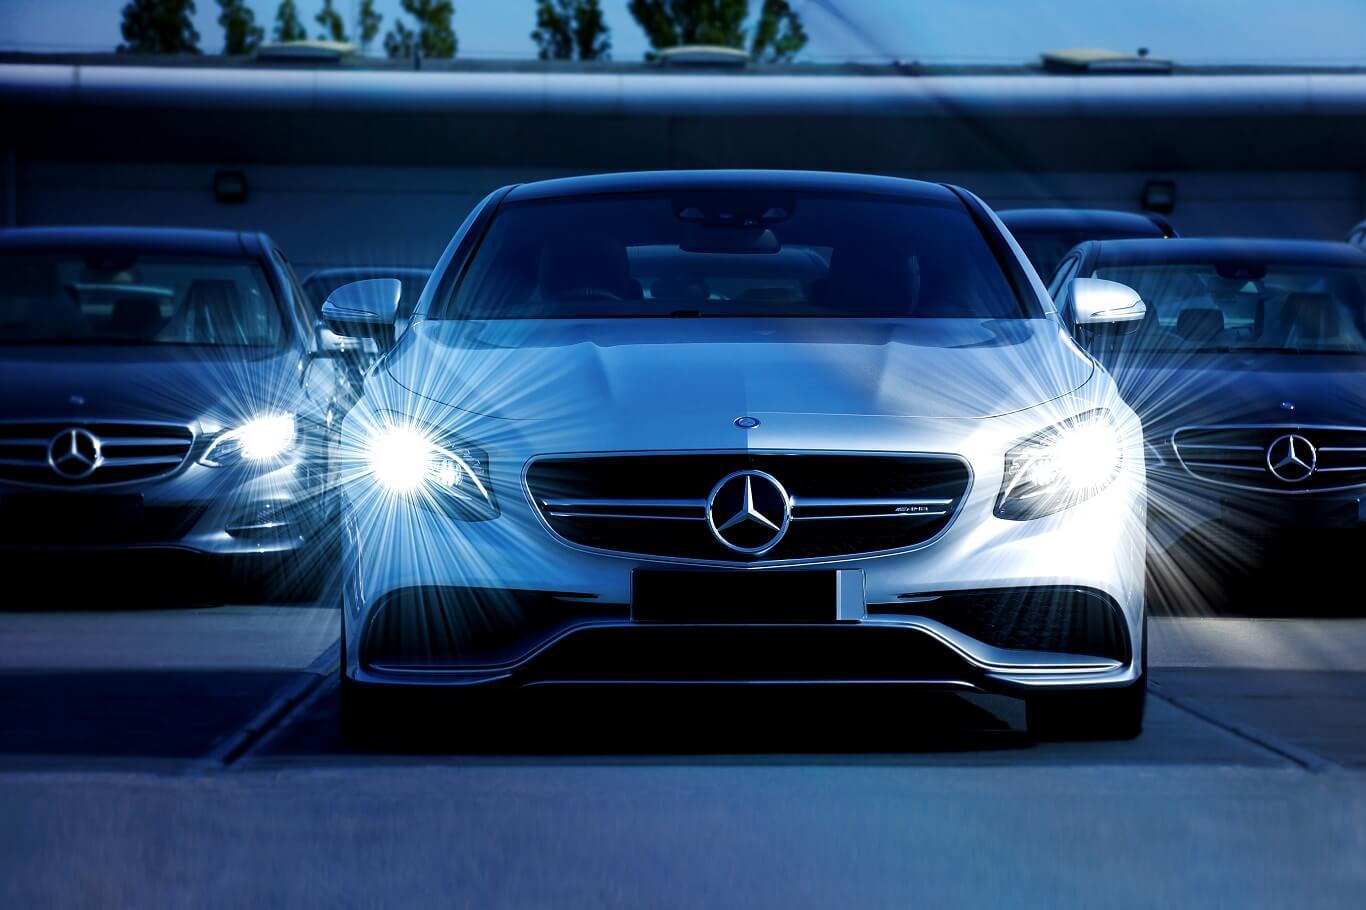 Best aftermarket LED headlights